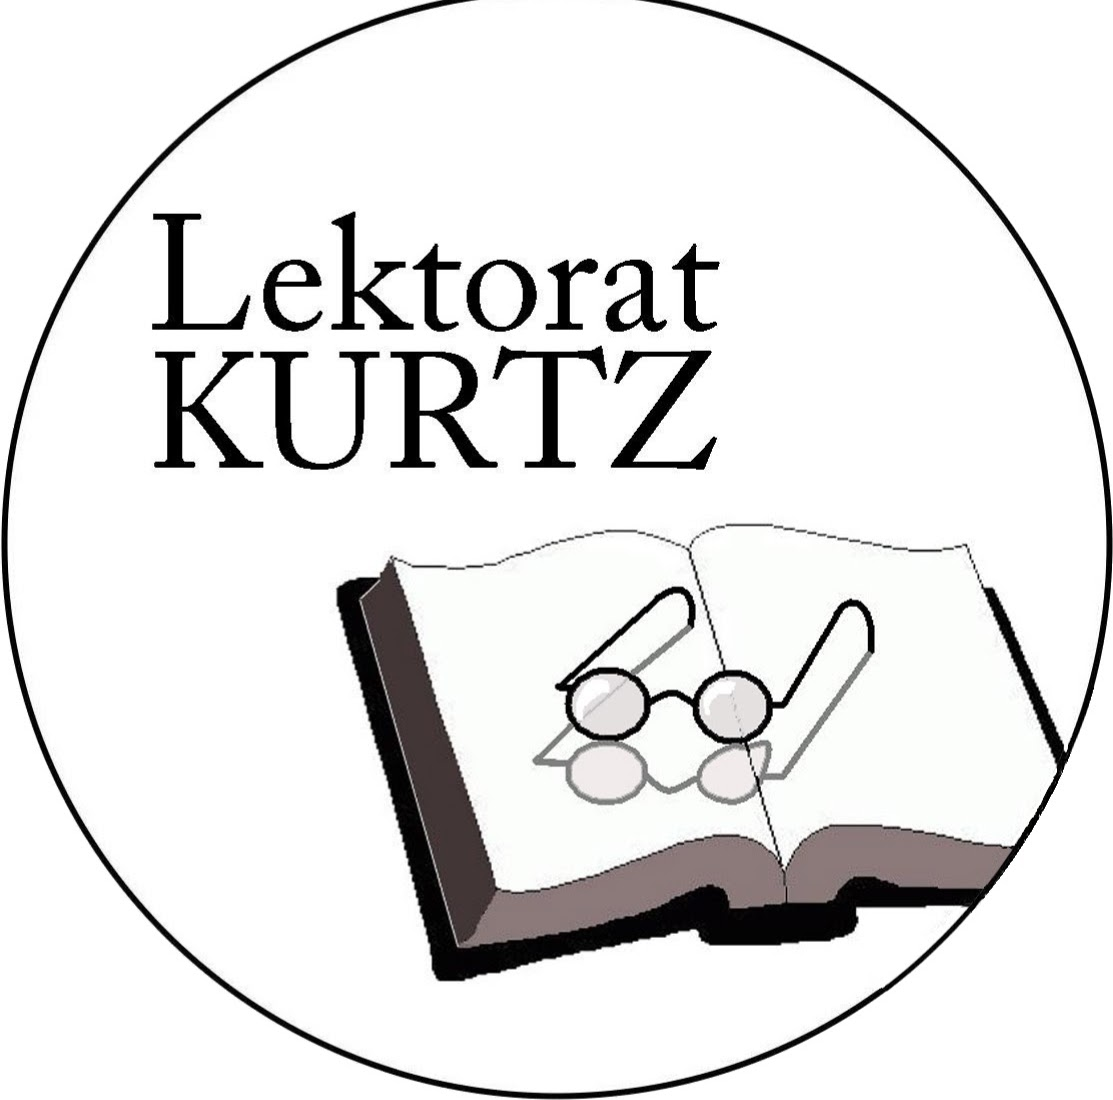 Kurtz Lektorat Berlin